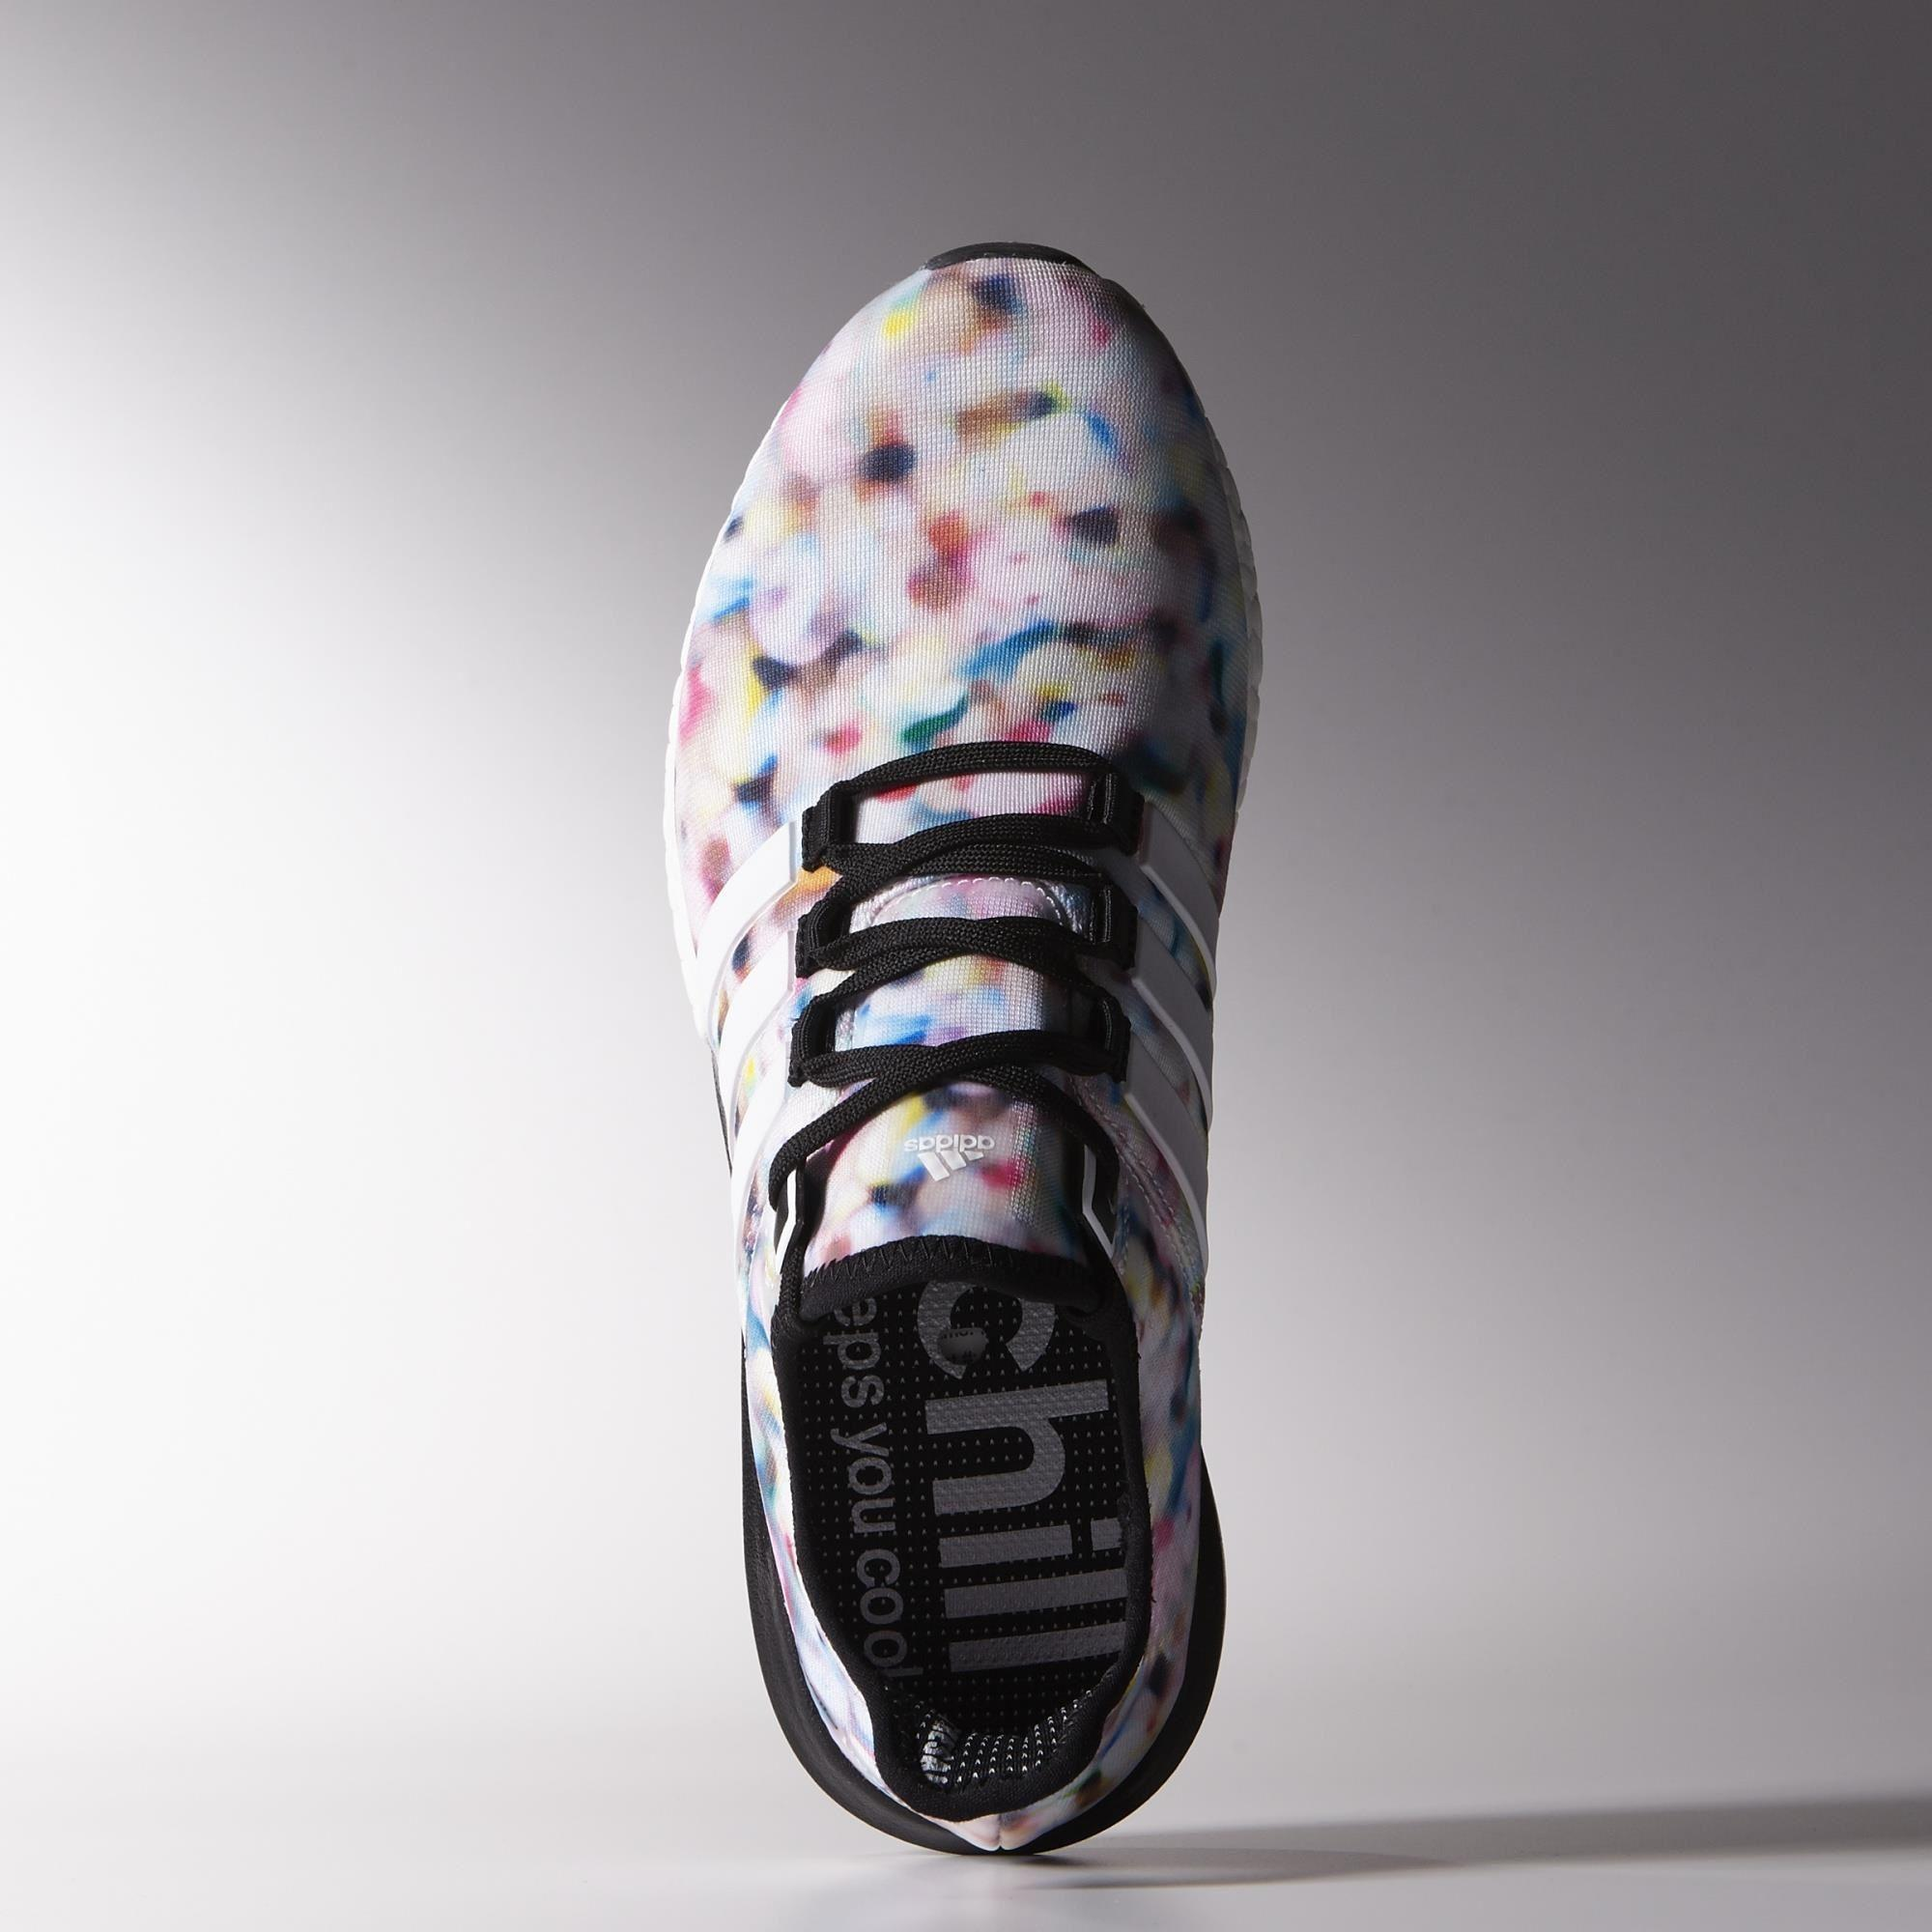 brand new c8bf0 dadb0 Adidas Womens Climachill Gazelle Boost Running Shoes - White Black